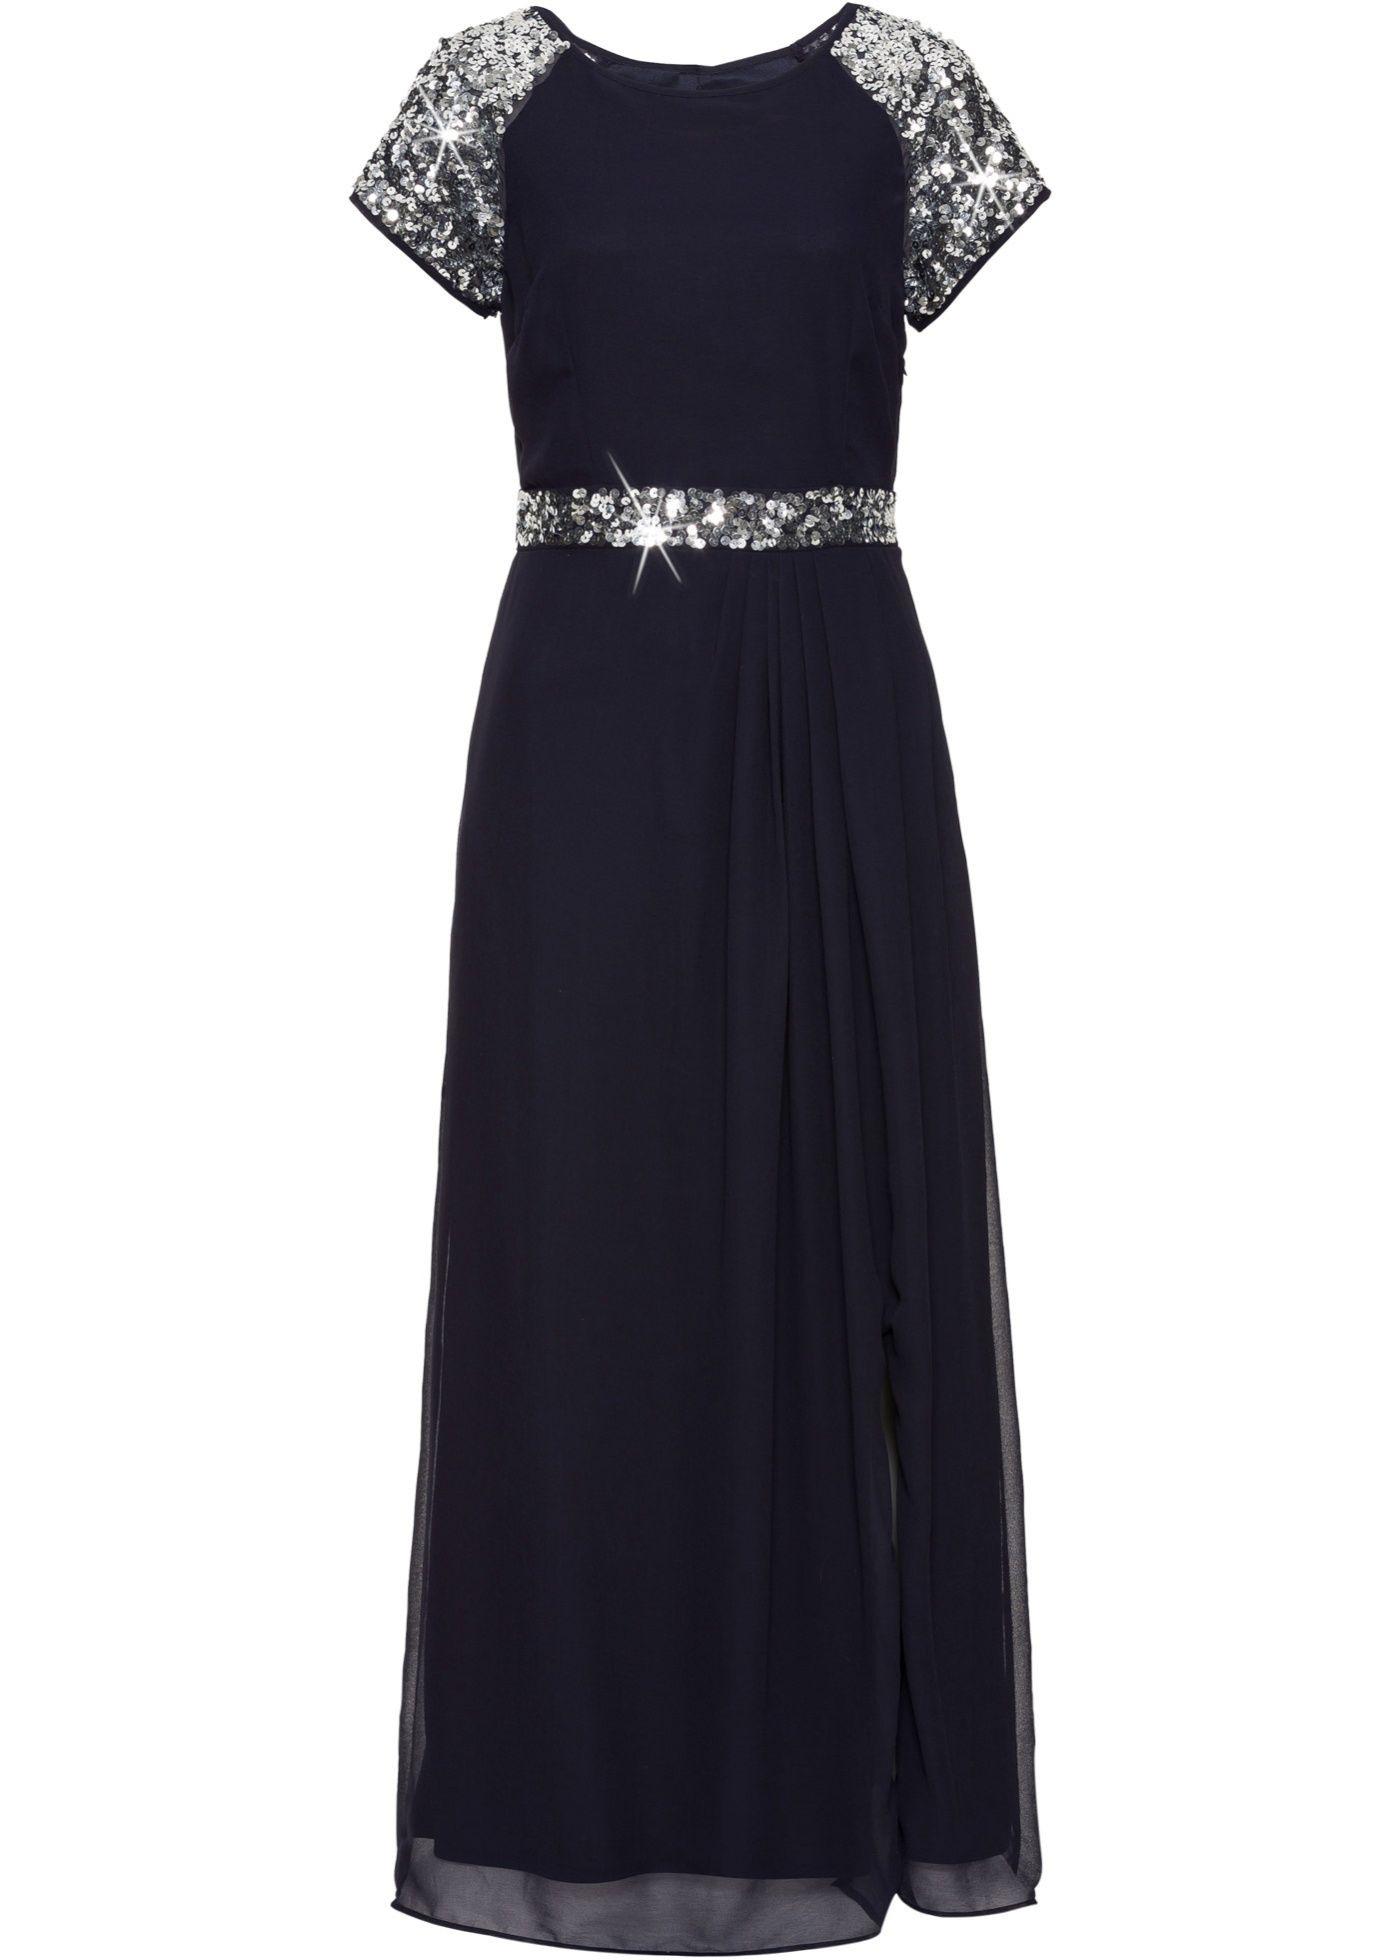 12 Top Bonprix Abendkleid Galerie - Abendkleid